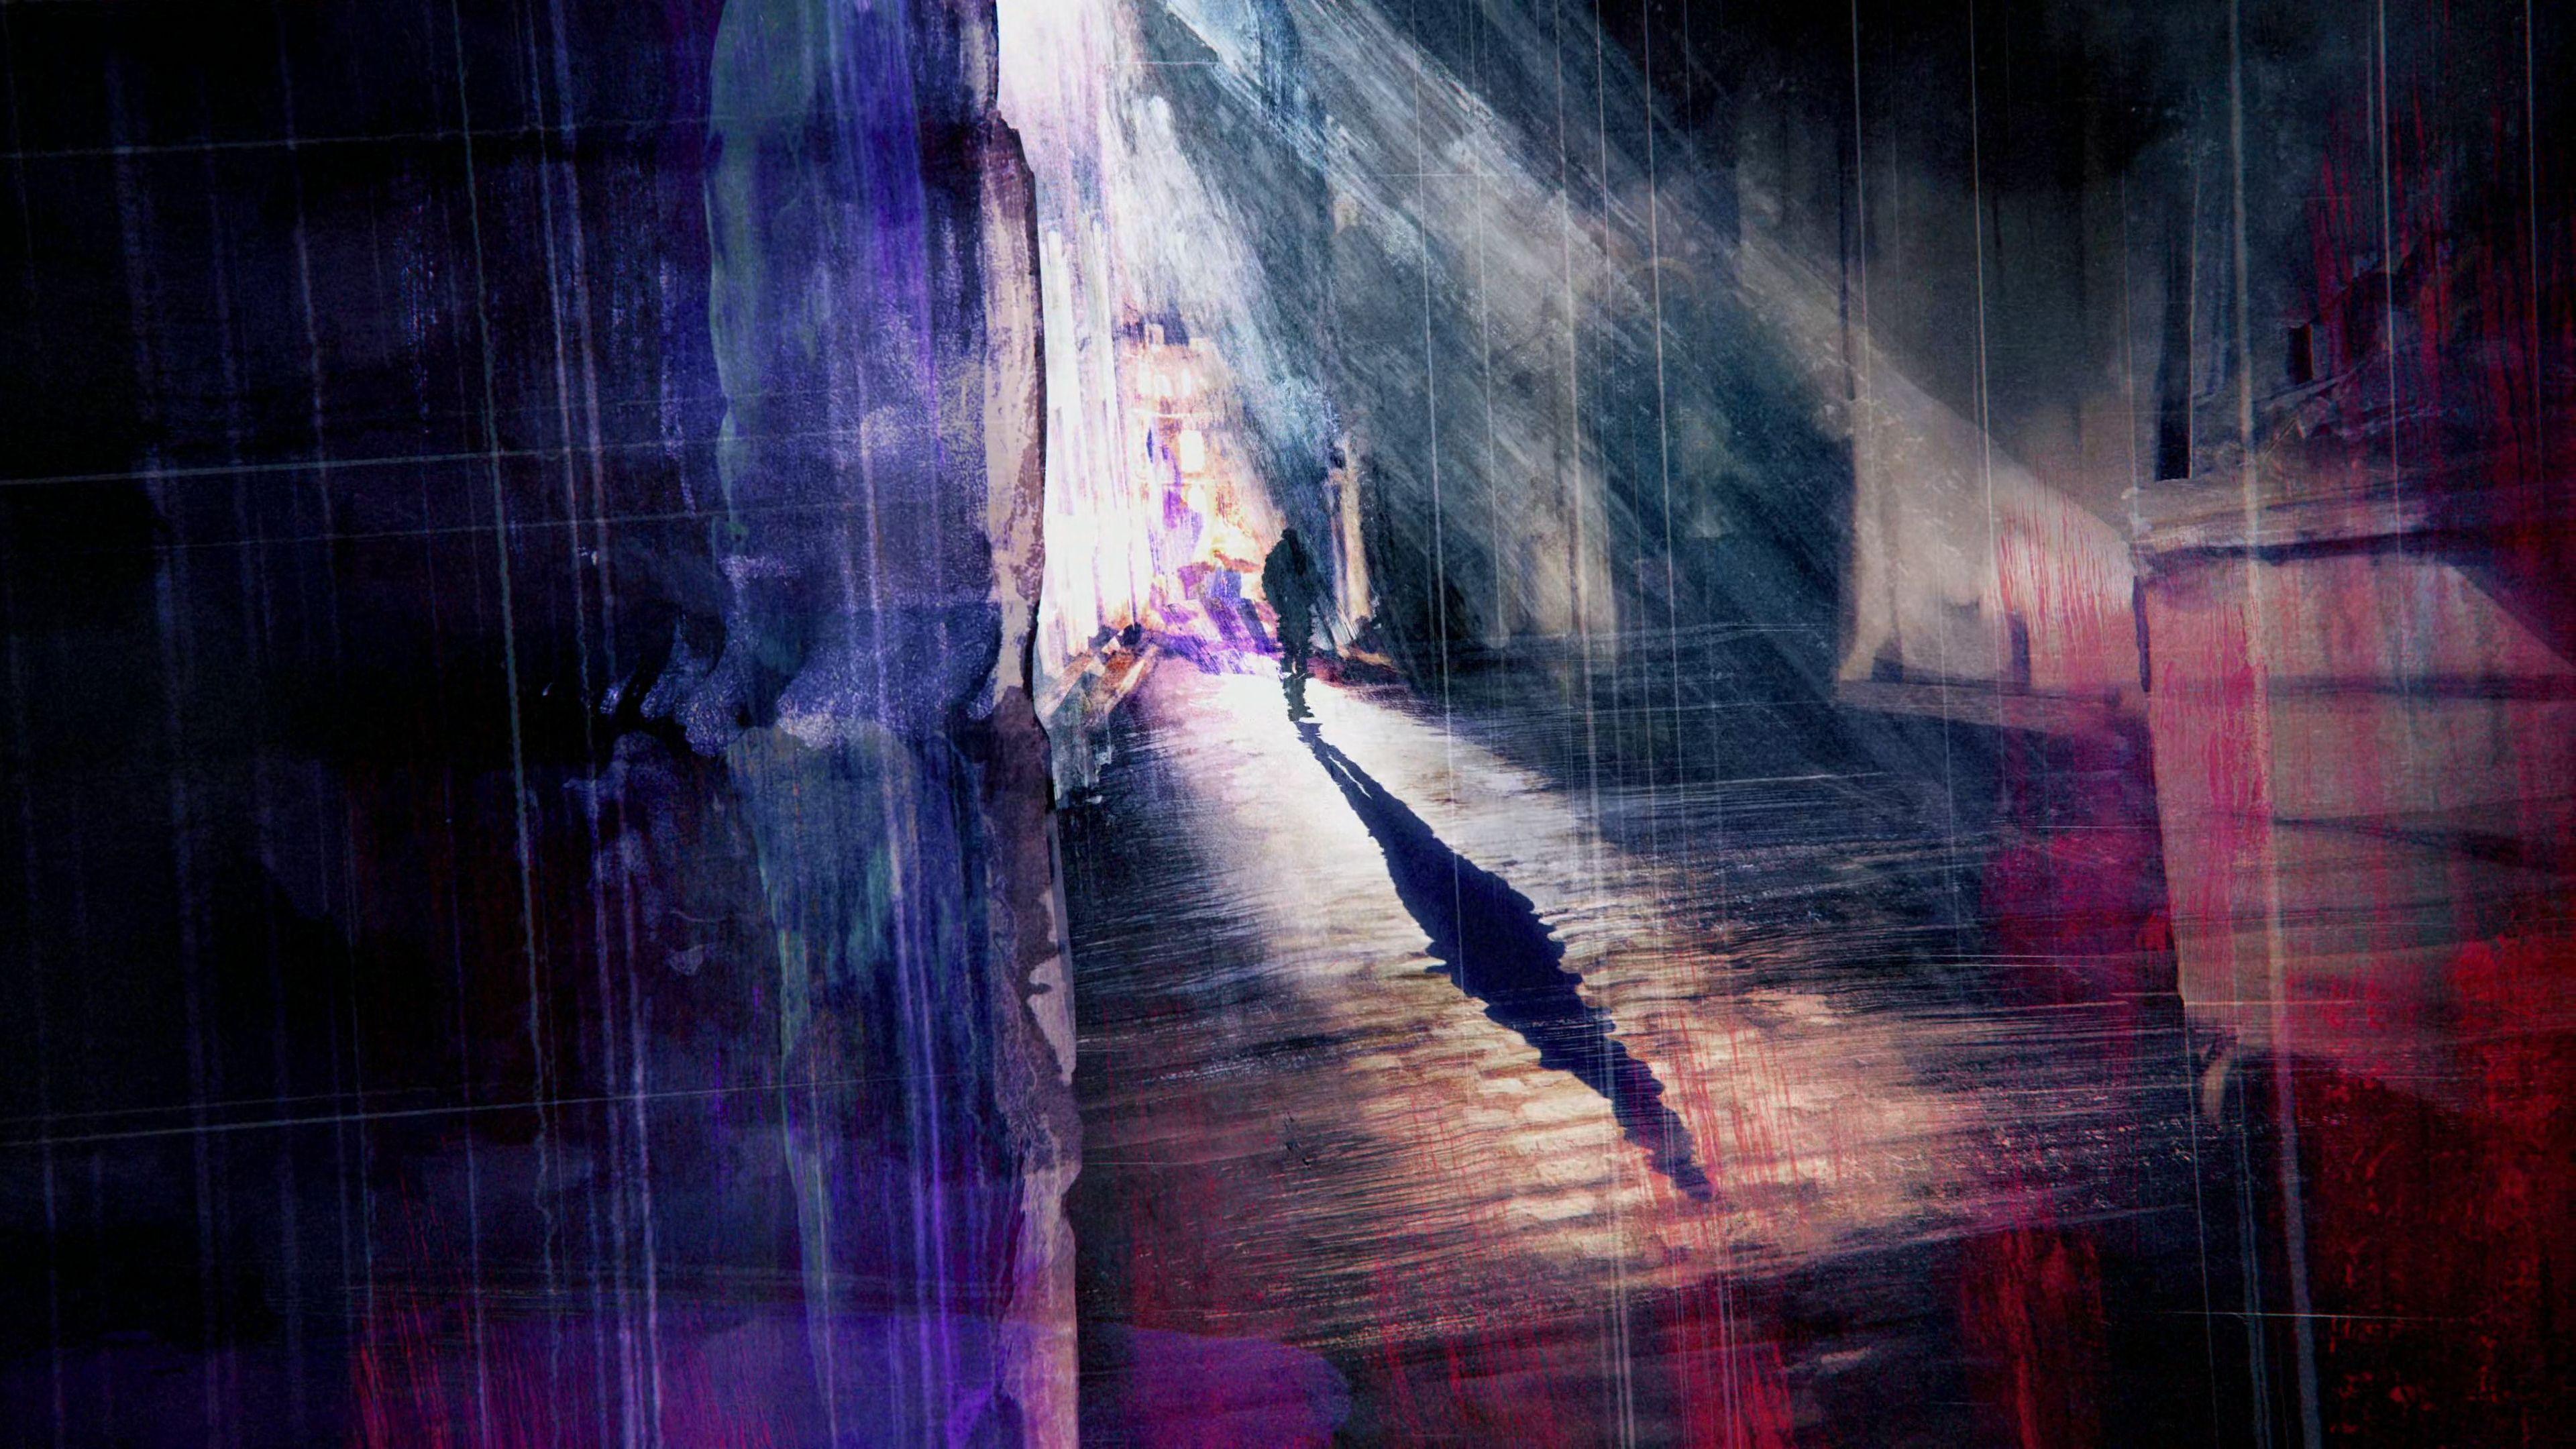 Jessica Jones Wallpaper - Imgur